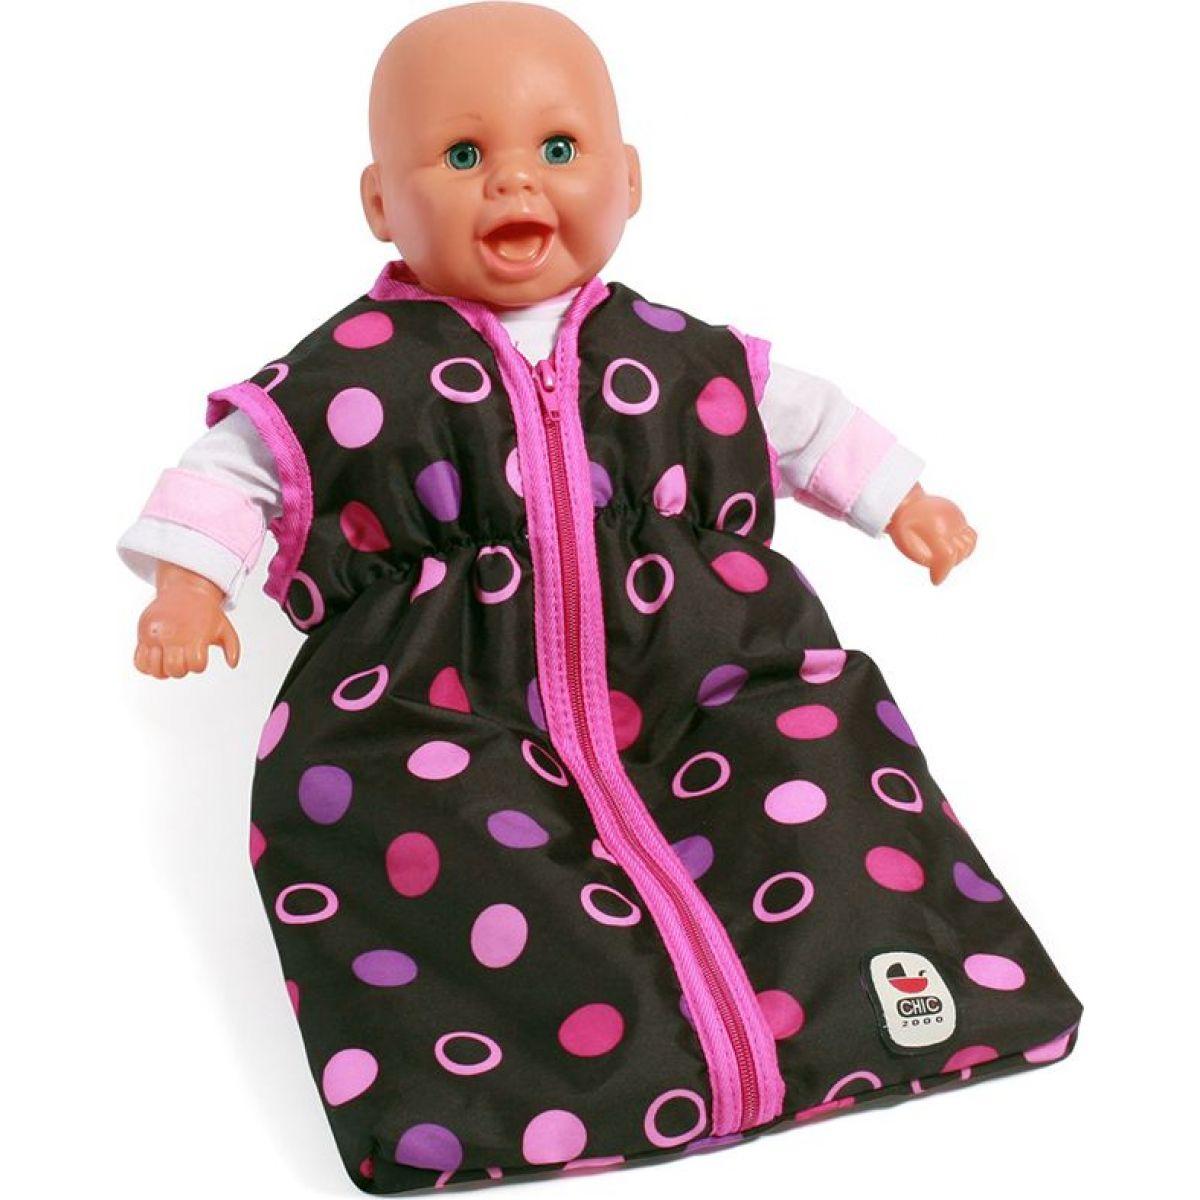 Bayer Chic Spací vak pre bábiky - Pinky Balls